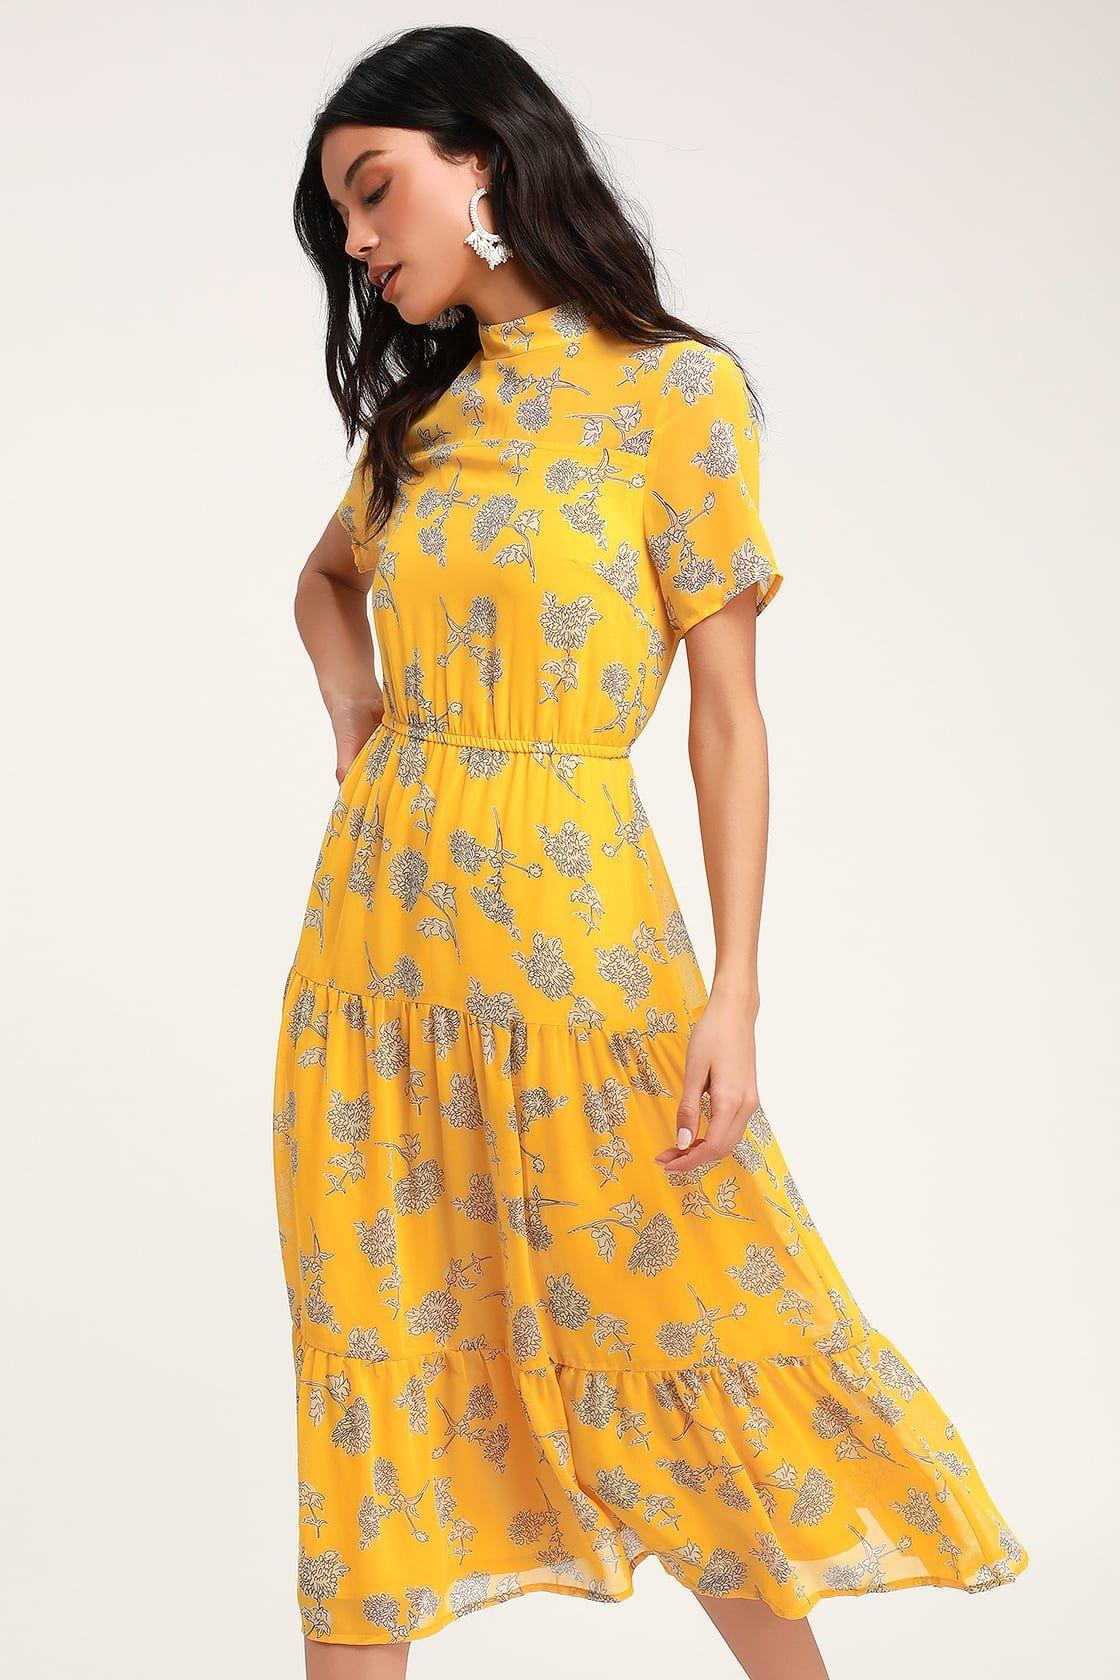 570f455b0a27 Lulus | Floral Dressed Up Mustard Yellow Floral Print Midi Dress ...